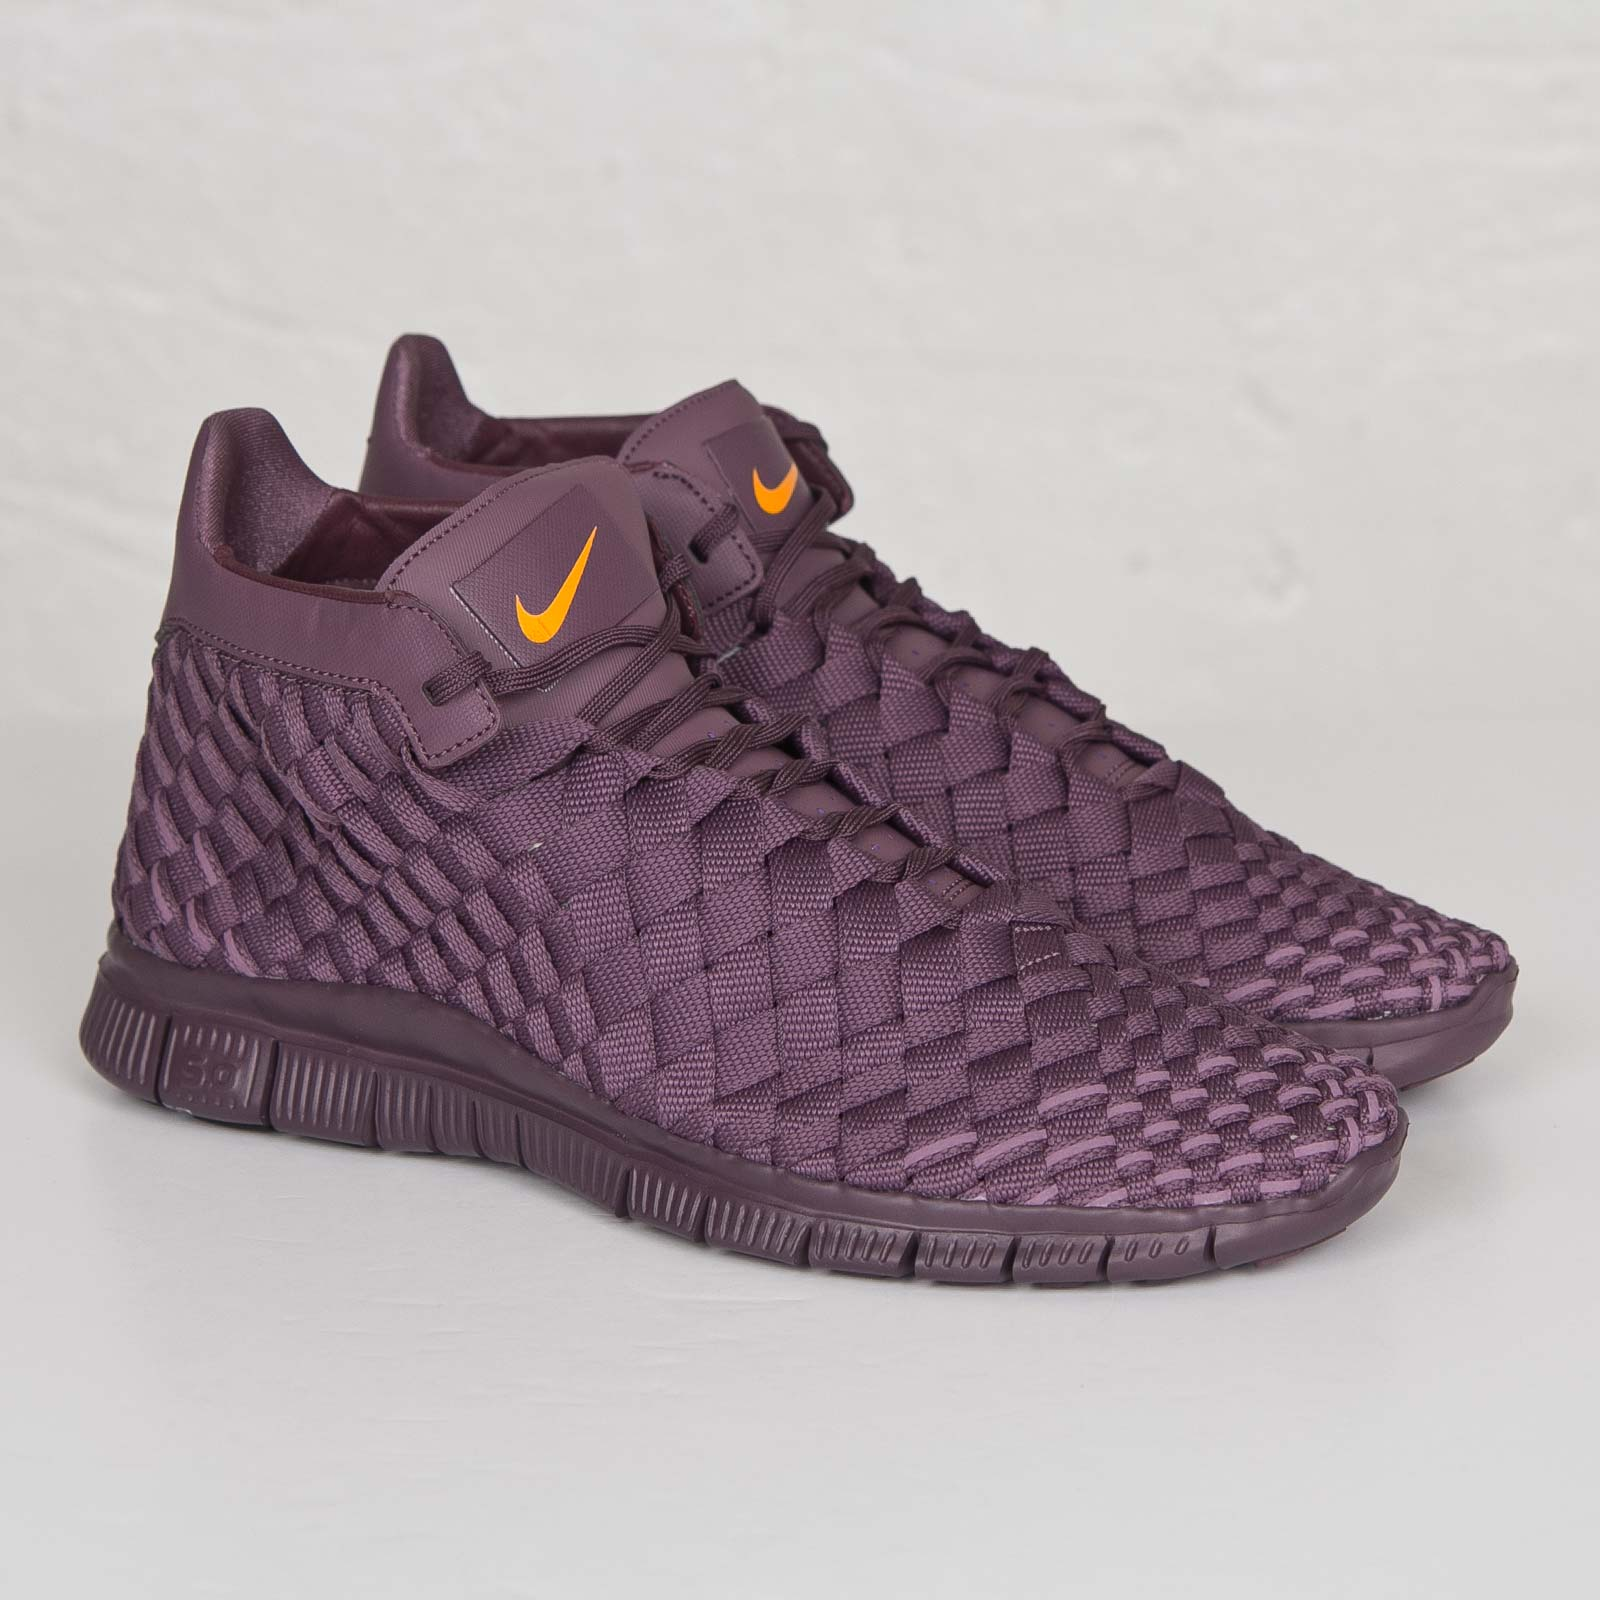 Nike Free Inneva Woven Mid SP - 800907-550 - Sneakersnstuff ... 240484ee6450